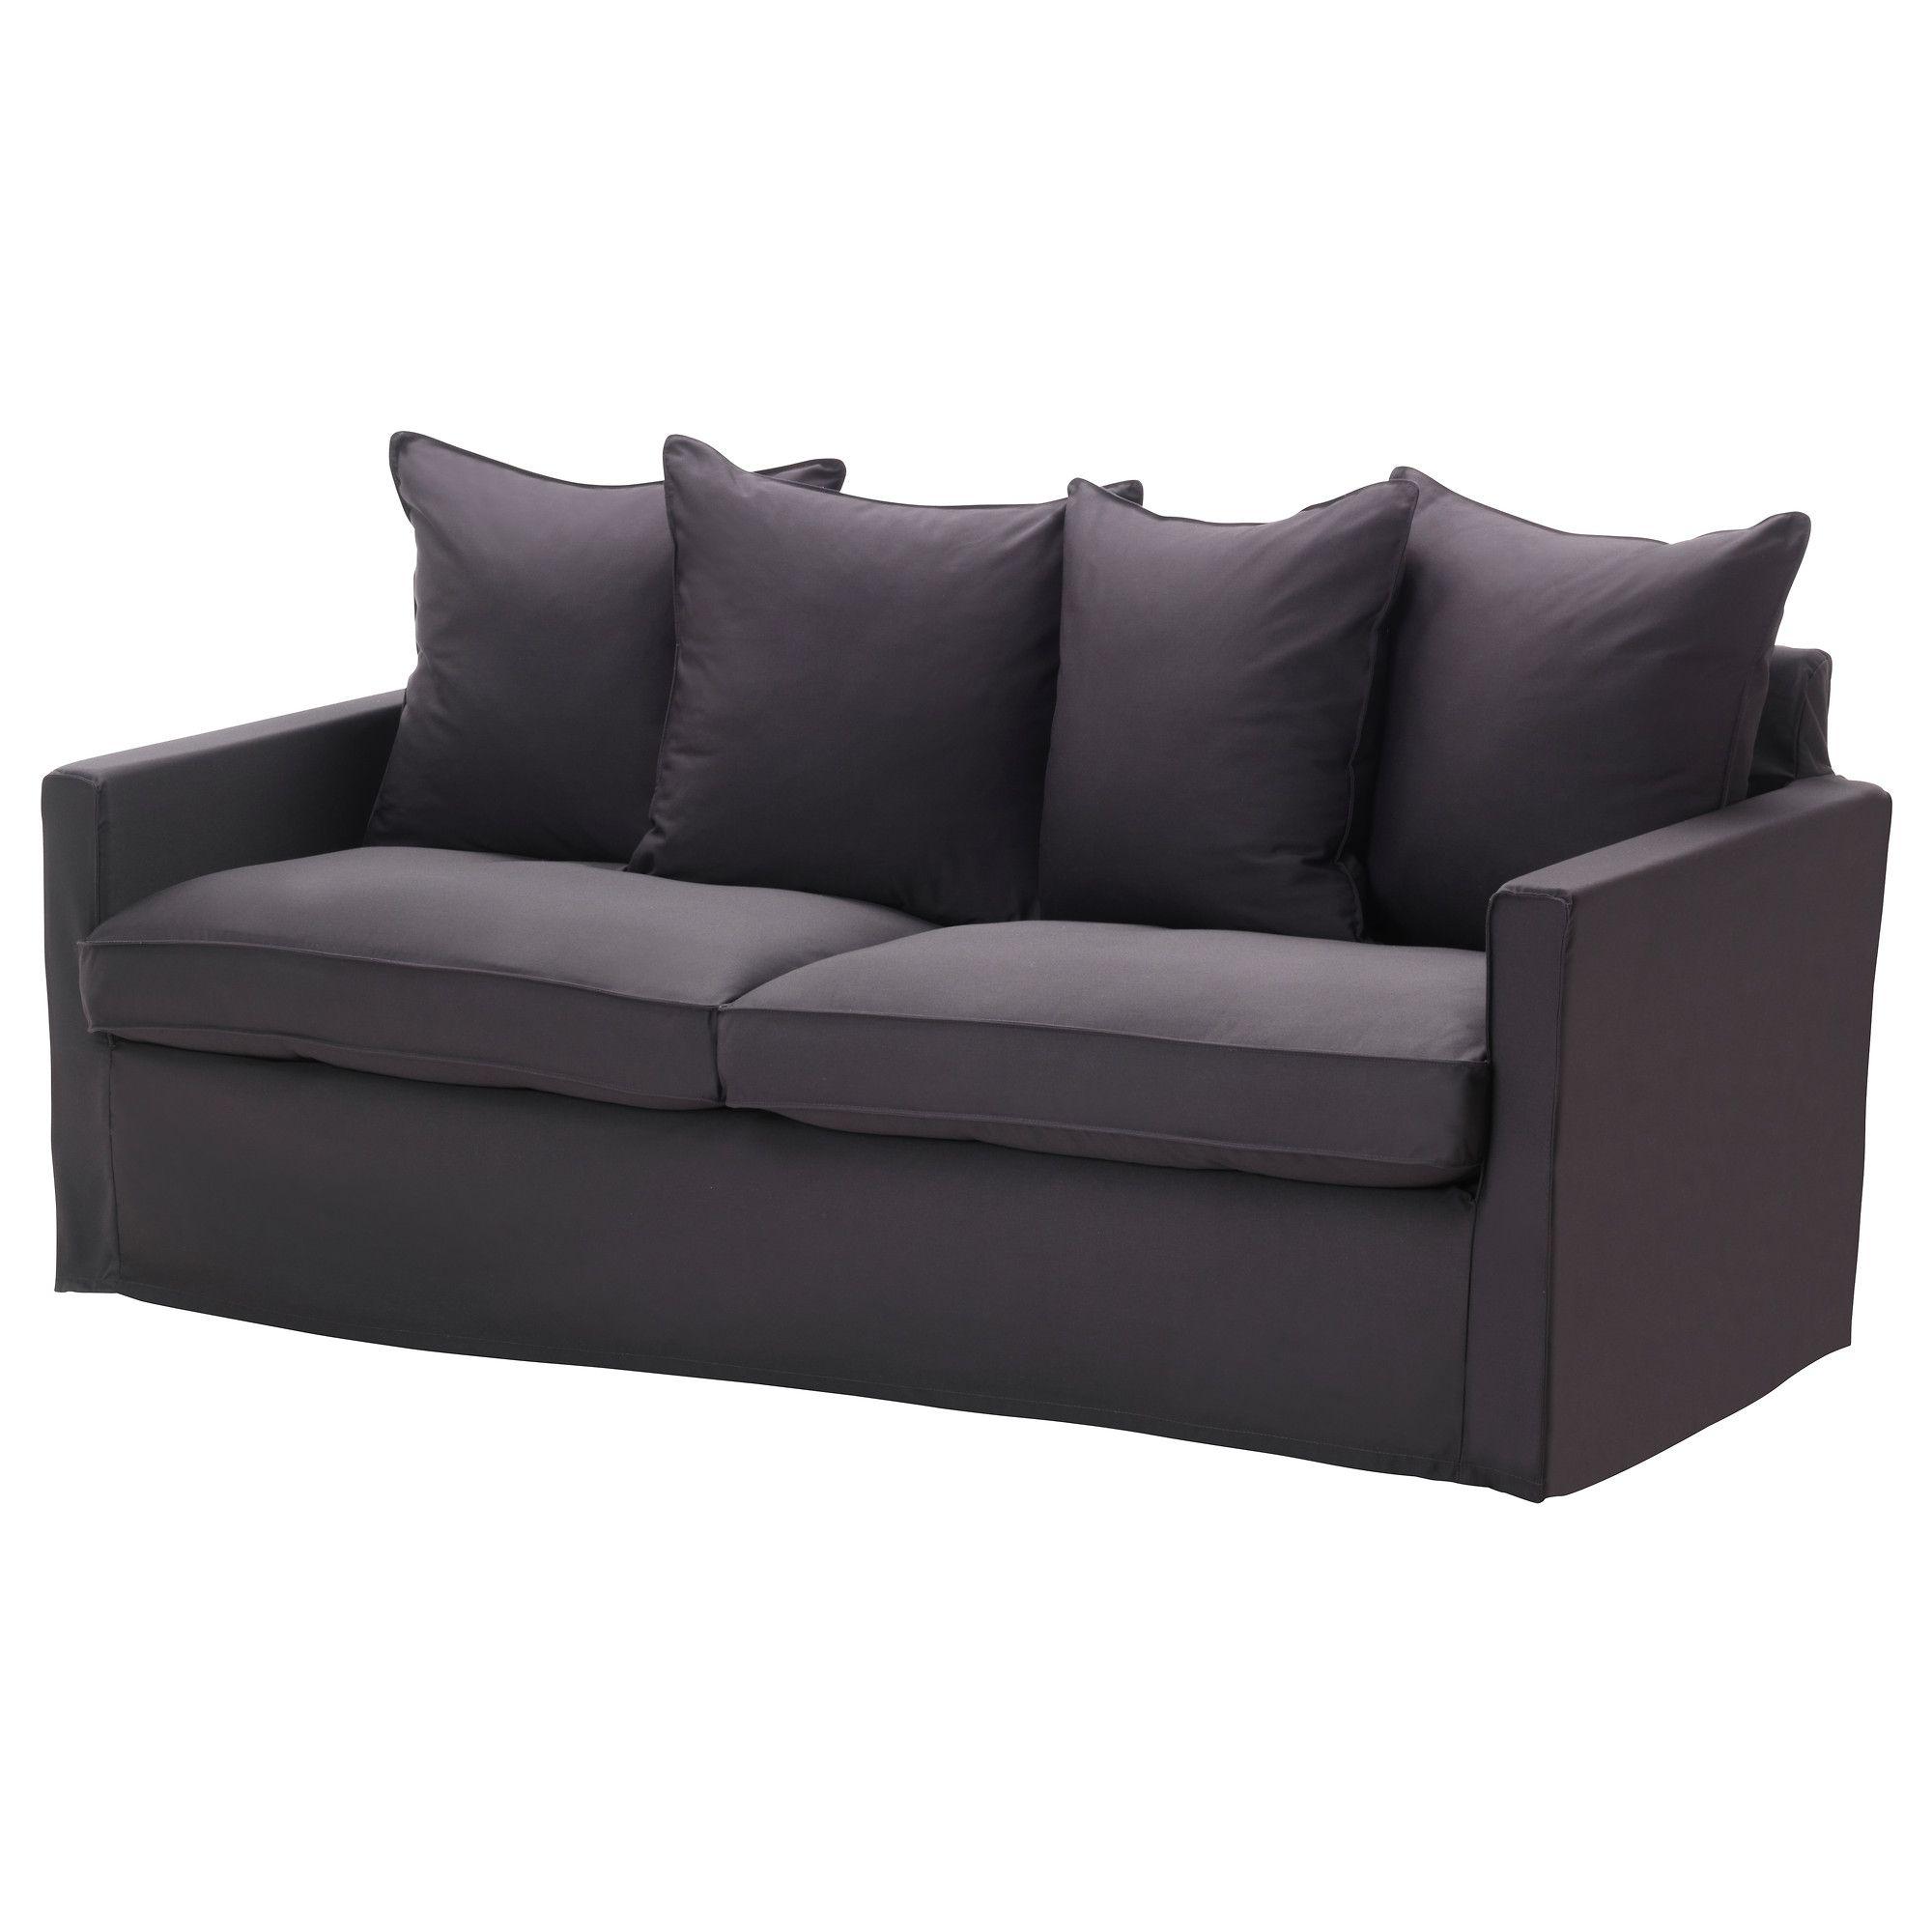 Vilmar Chair Instructions Swivel Gliders 349 00 For The Living Room HÄrnÖsand Sofa Olstorp